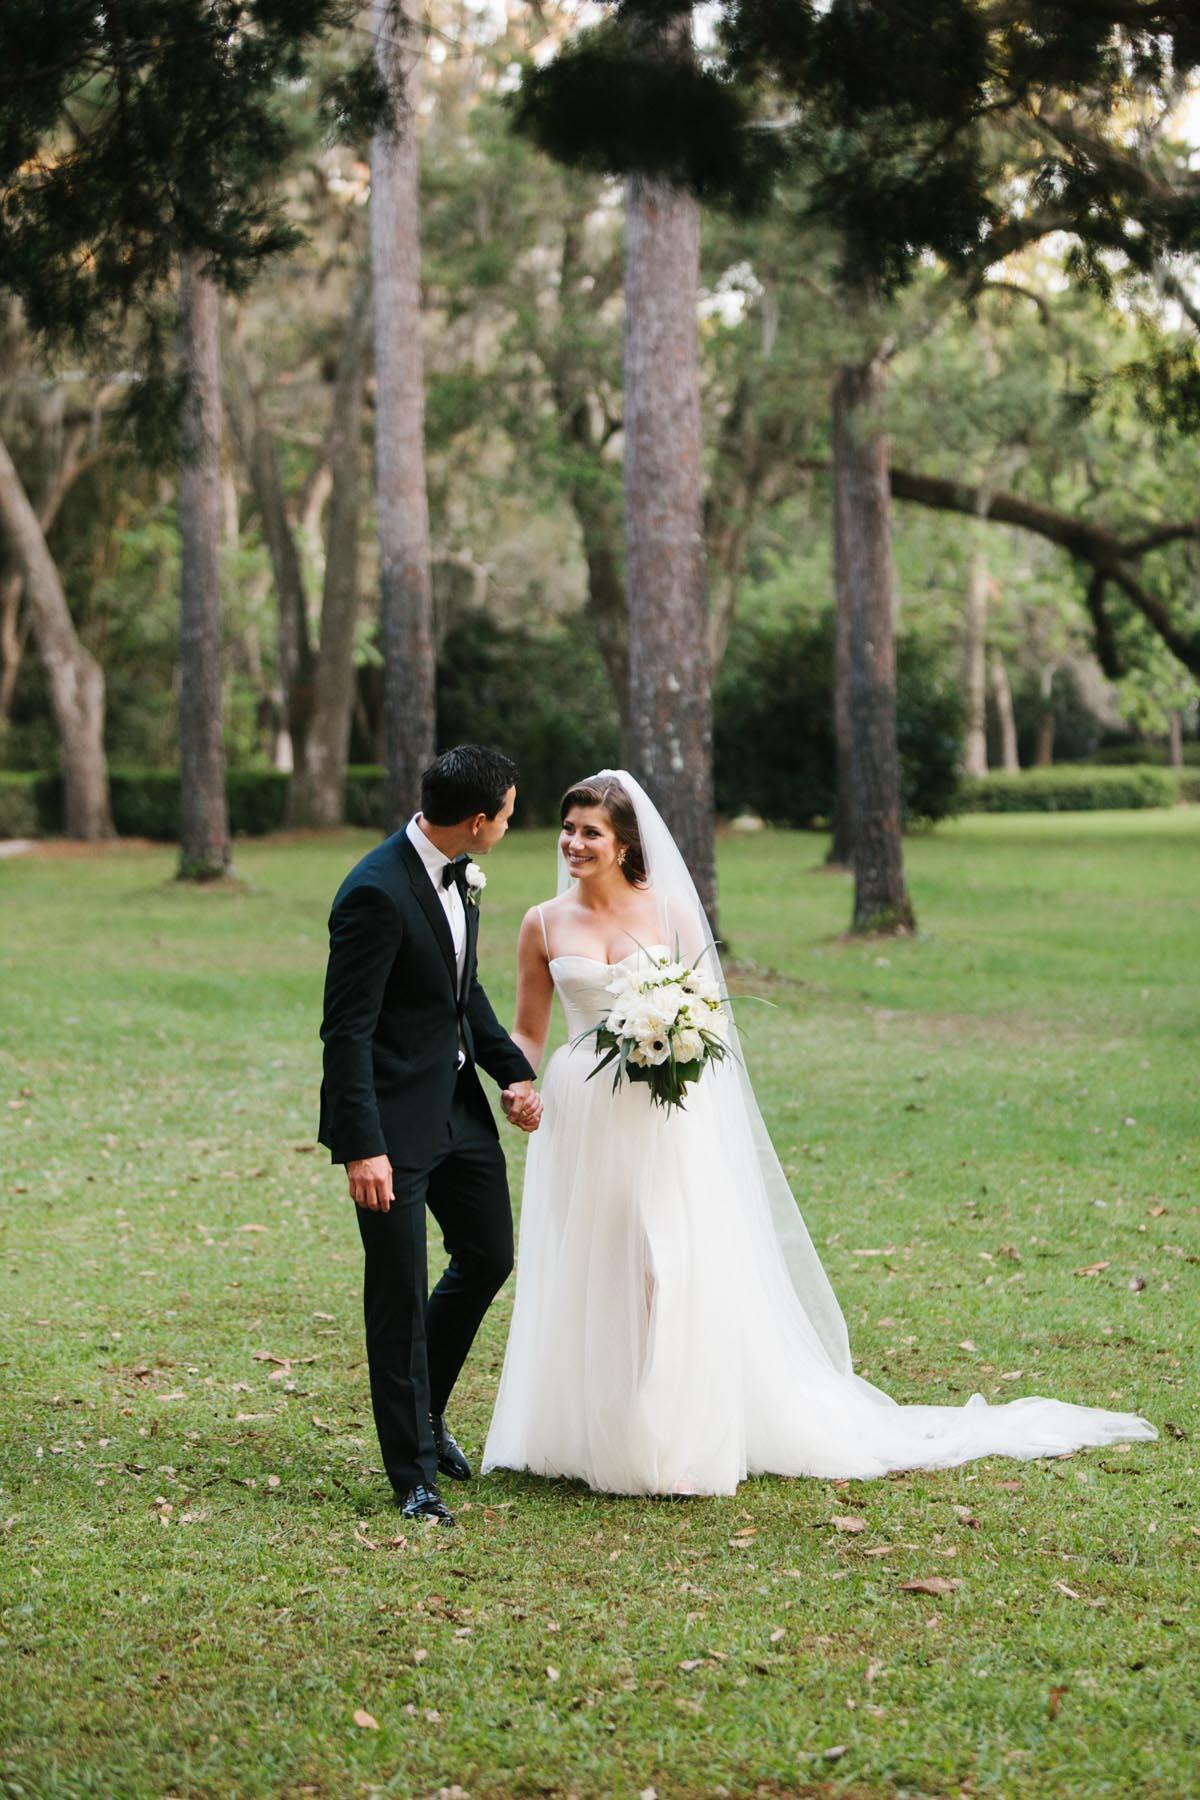 lowry wedding blog eden garden florida wedding-99